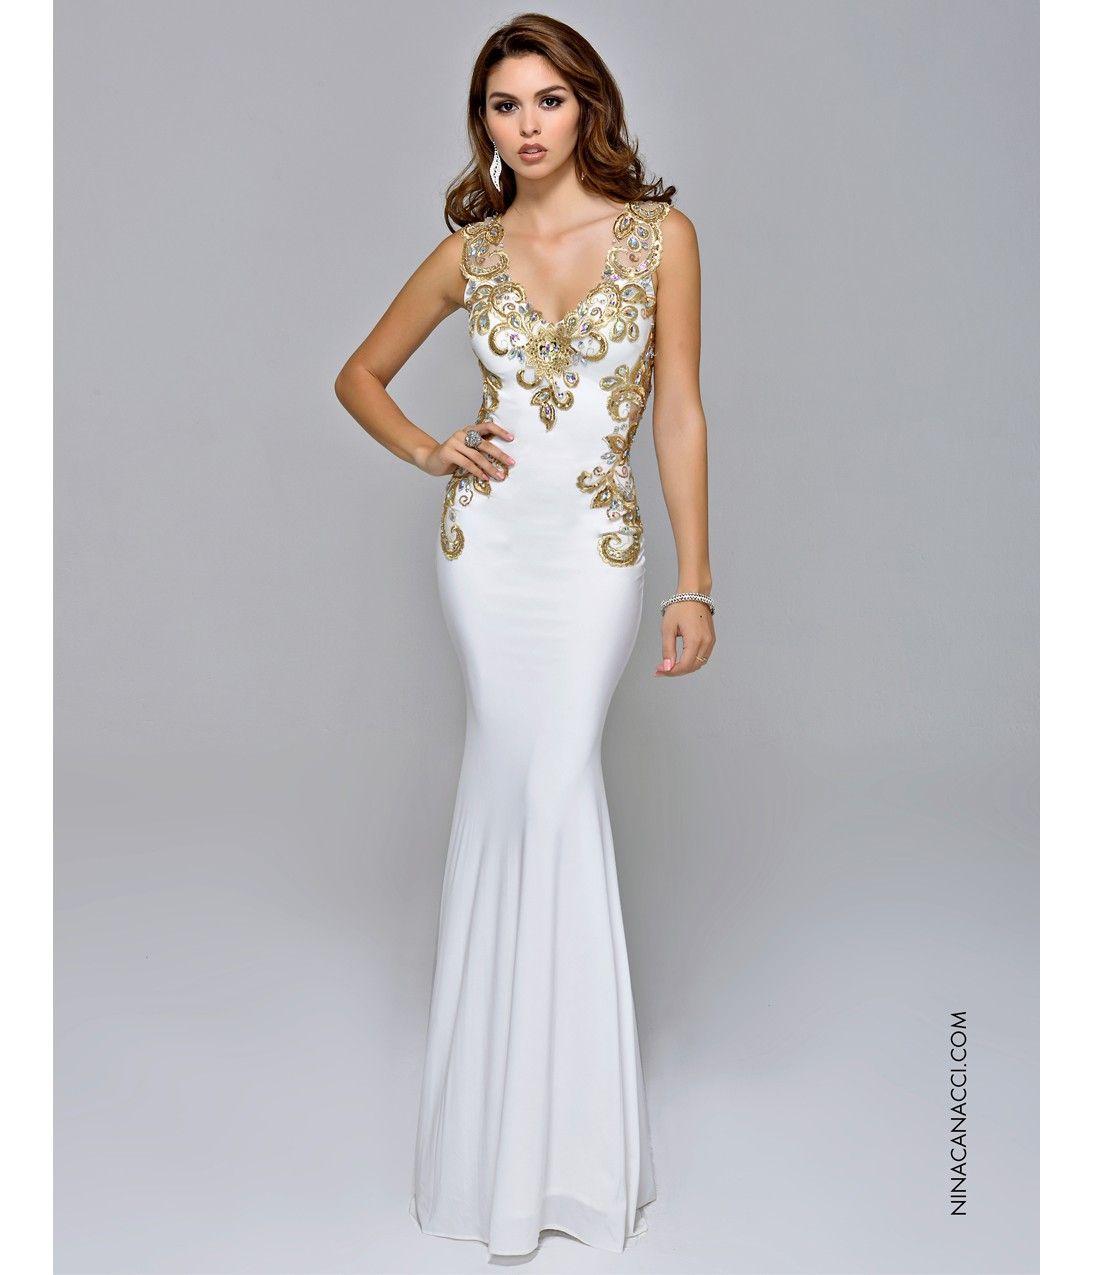 White Metallic Prom Dresses